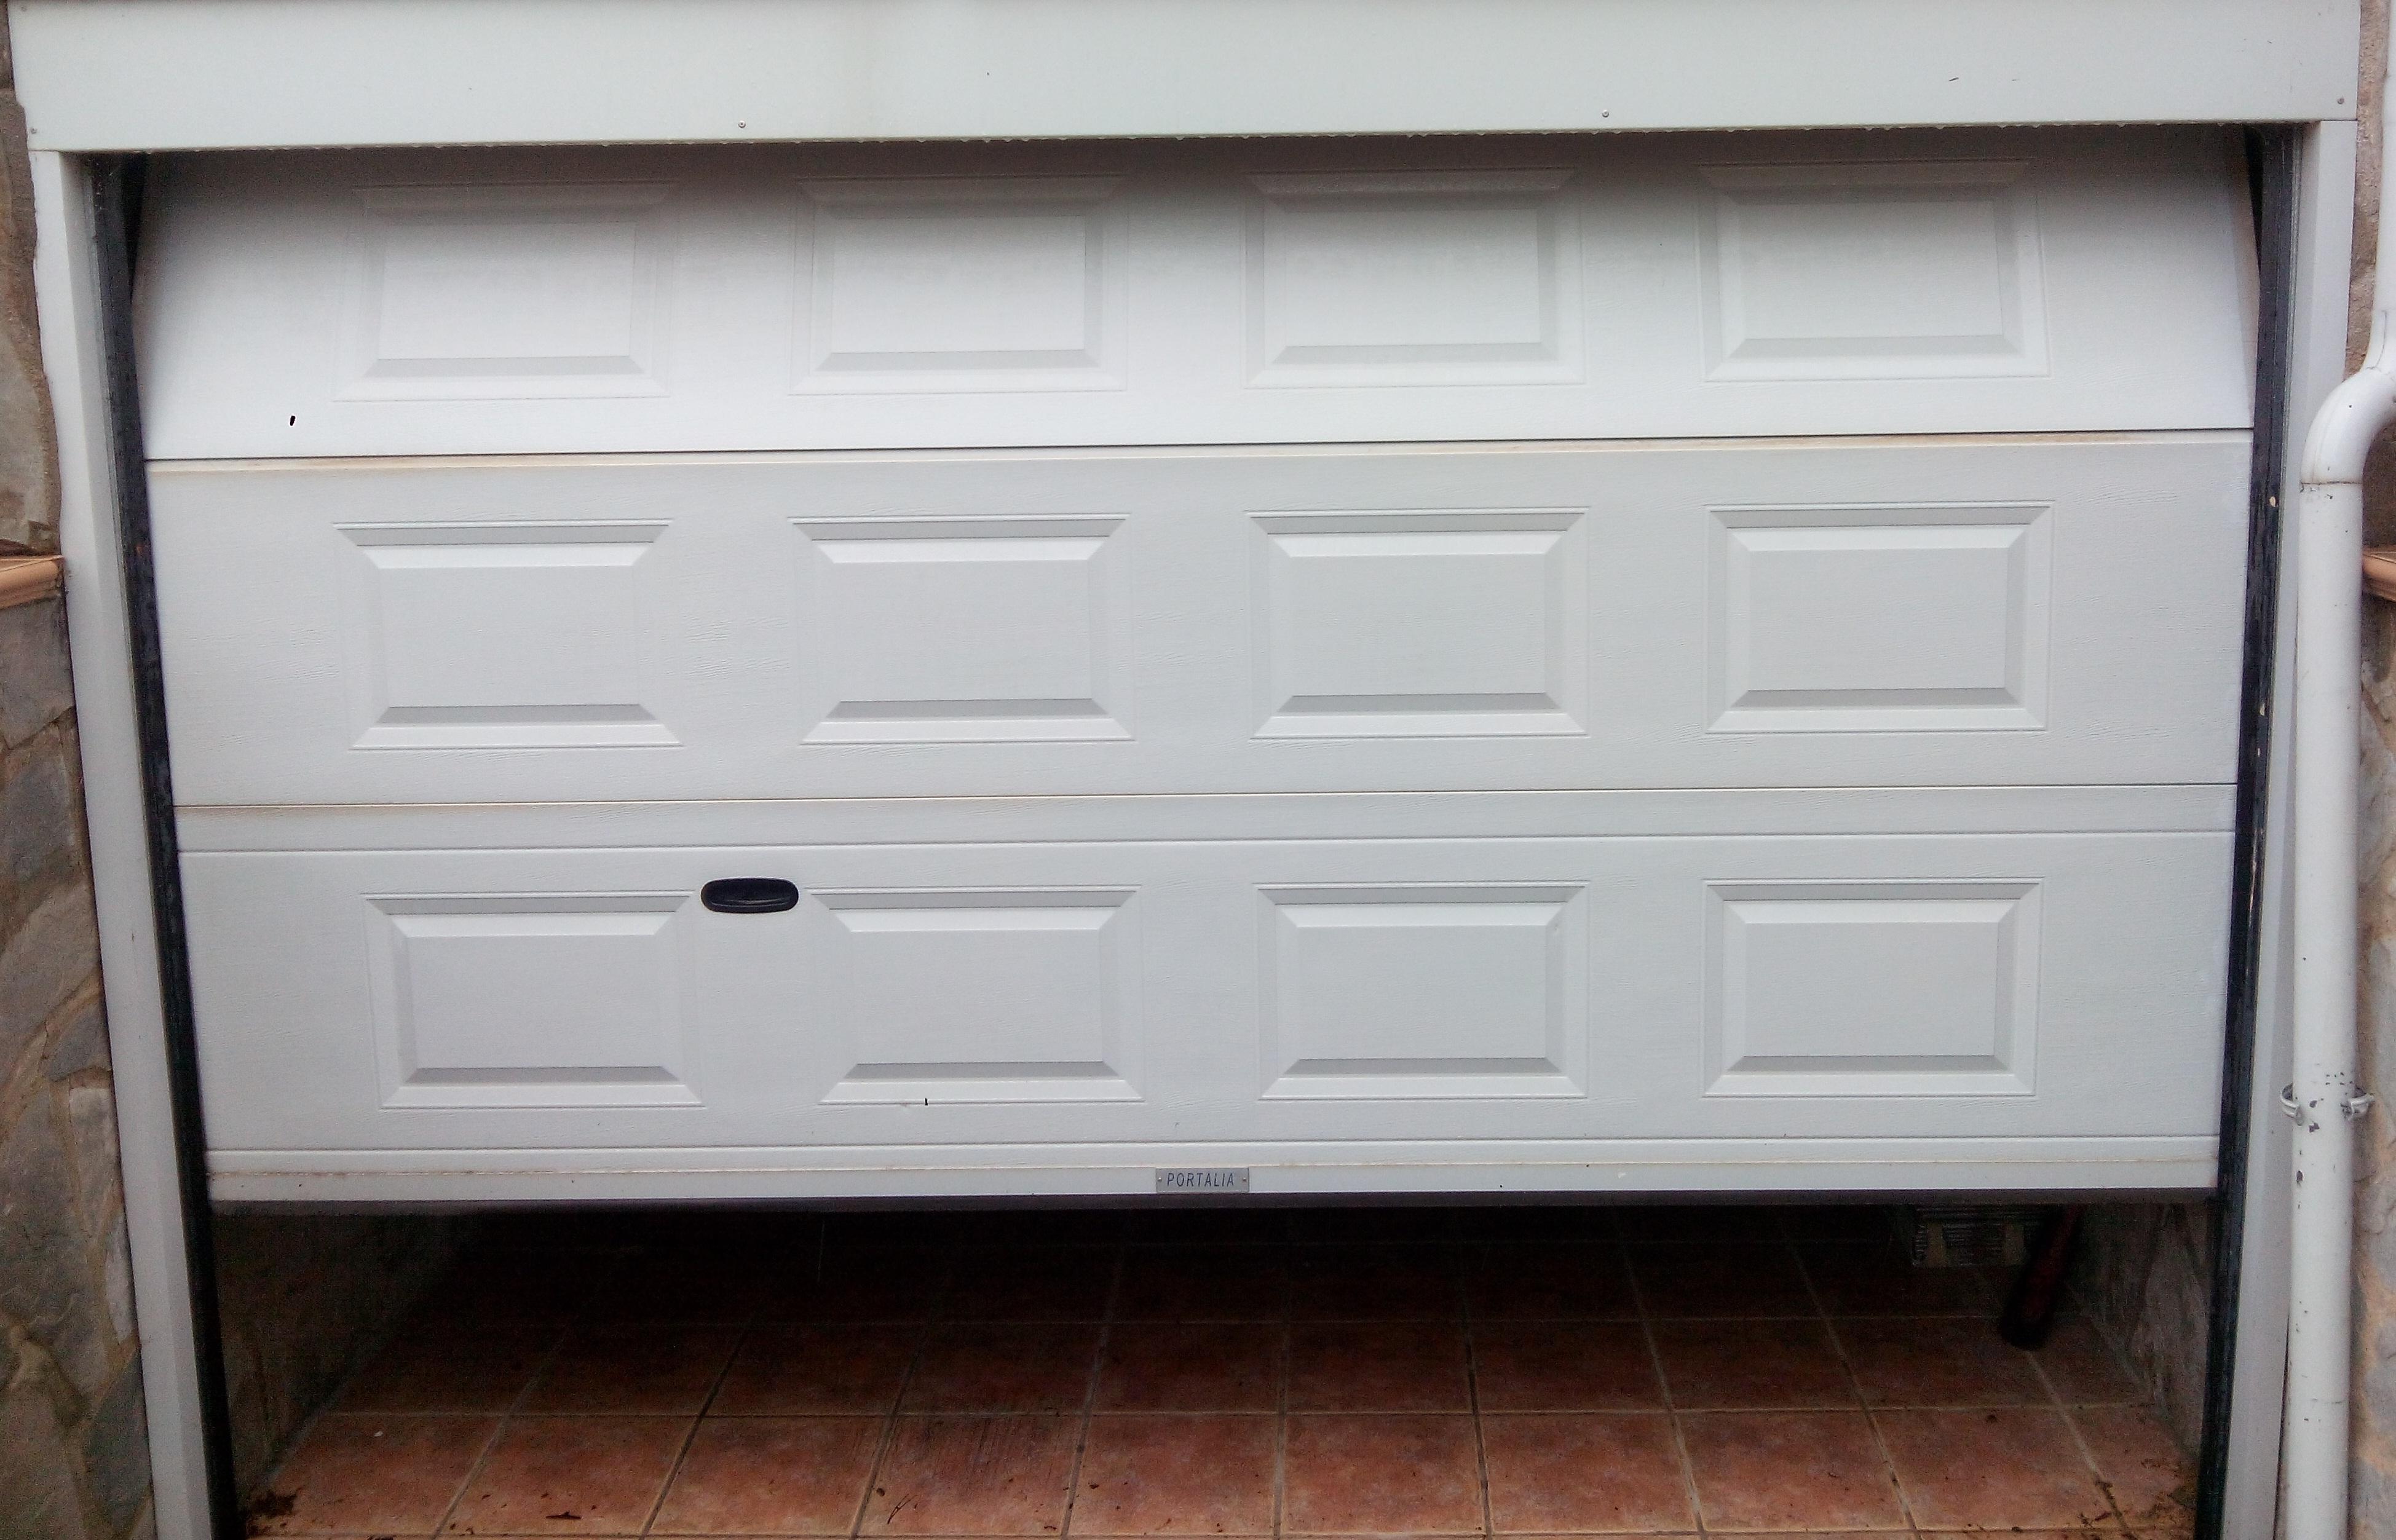 Montaje puertas de garaje montajes de aluminio dg for Paneles de aluminio para puertas